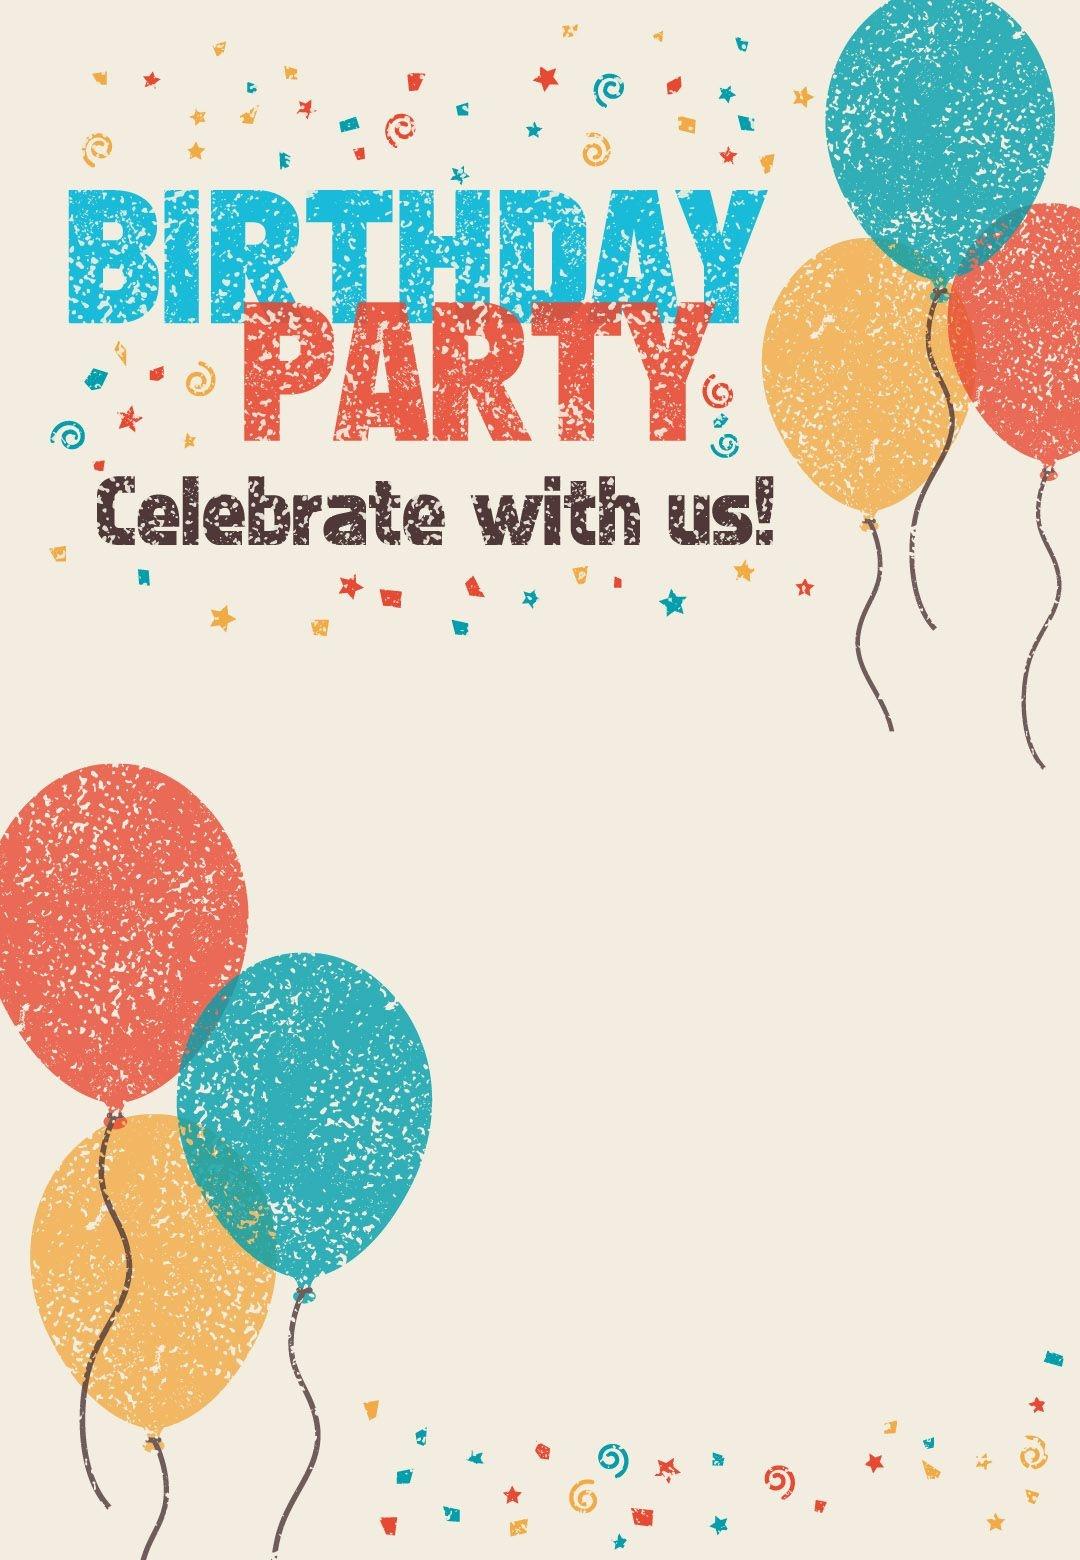 Free Printable Celebrate With Us Invitation - Great Site For - Free Printable Birthday Invitations Pinterest